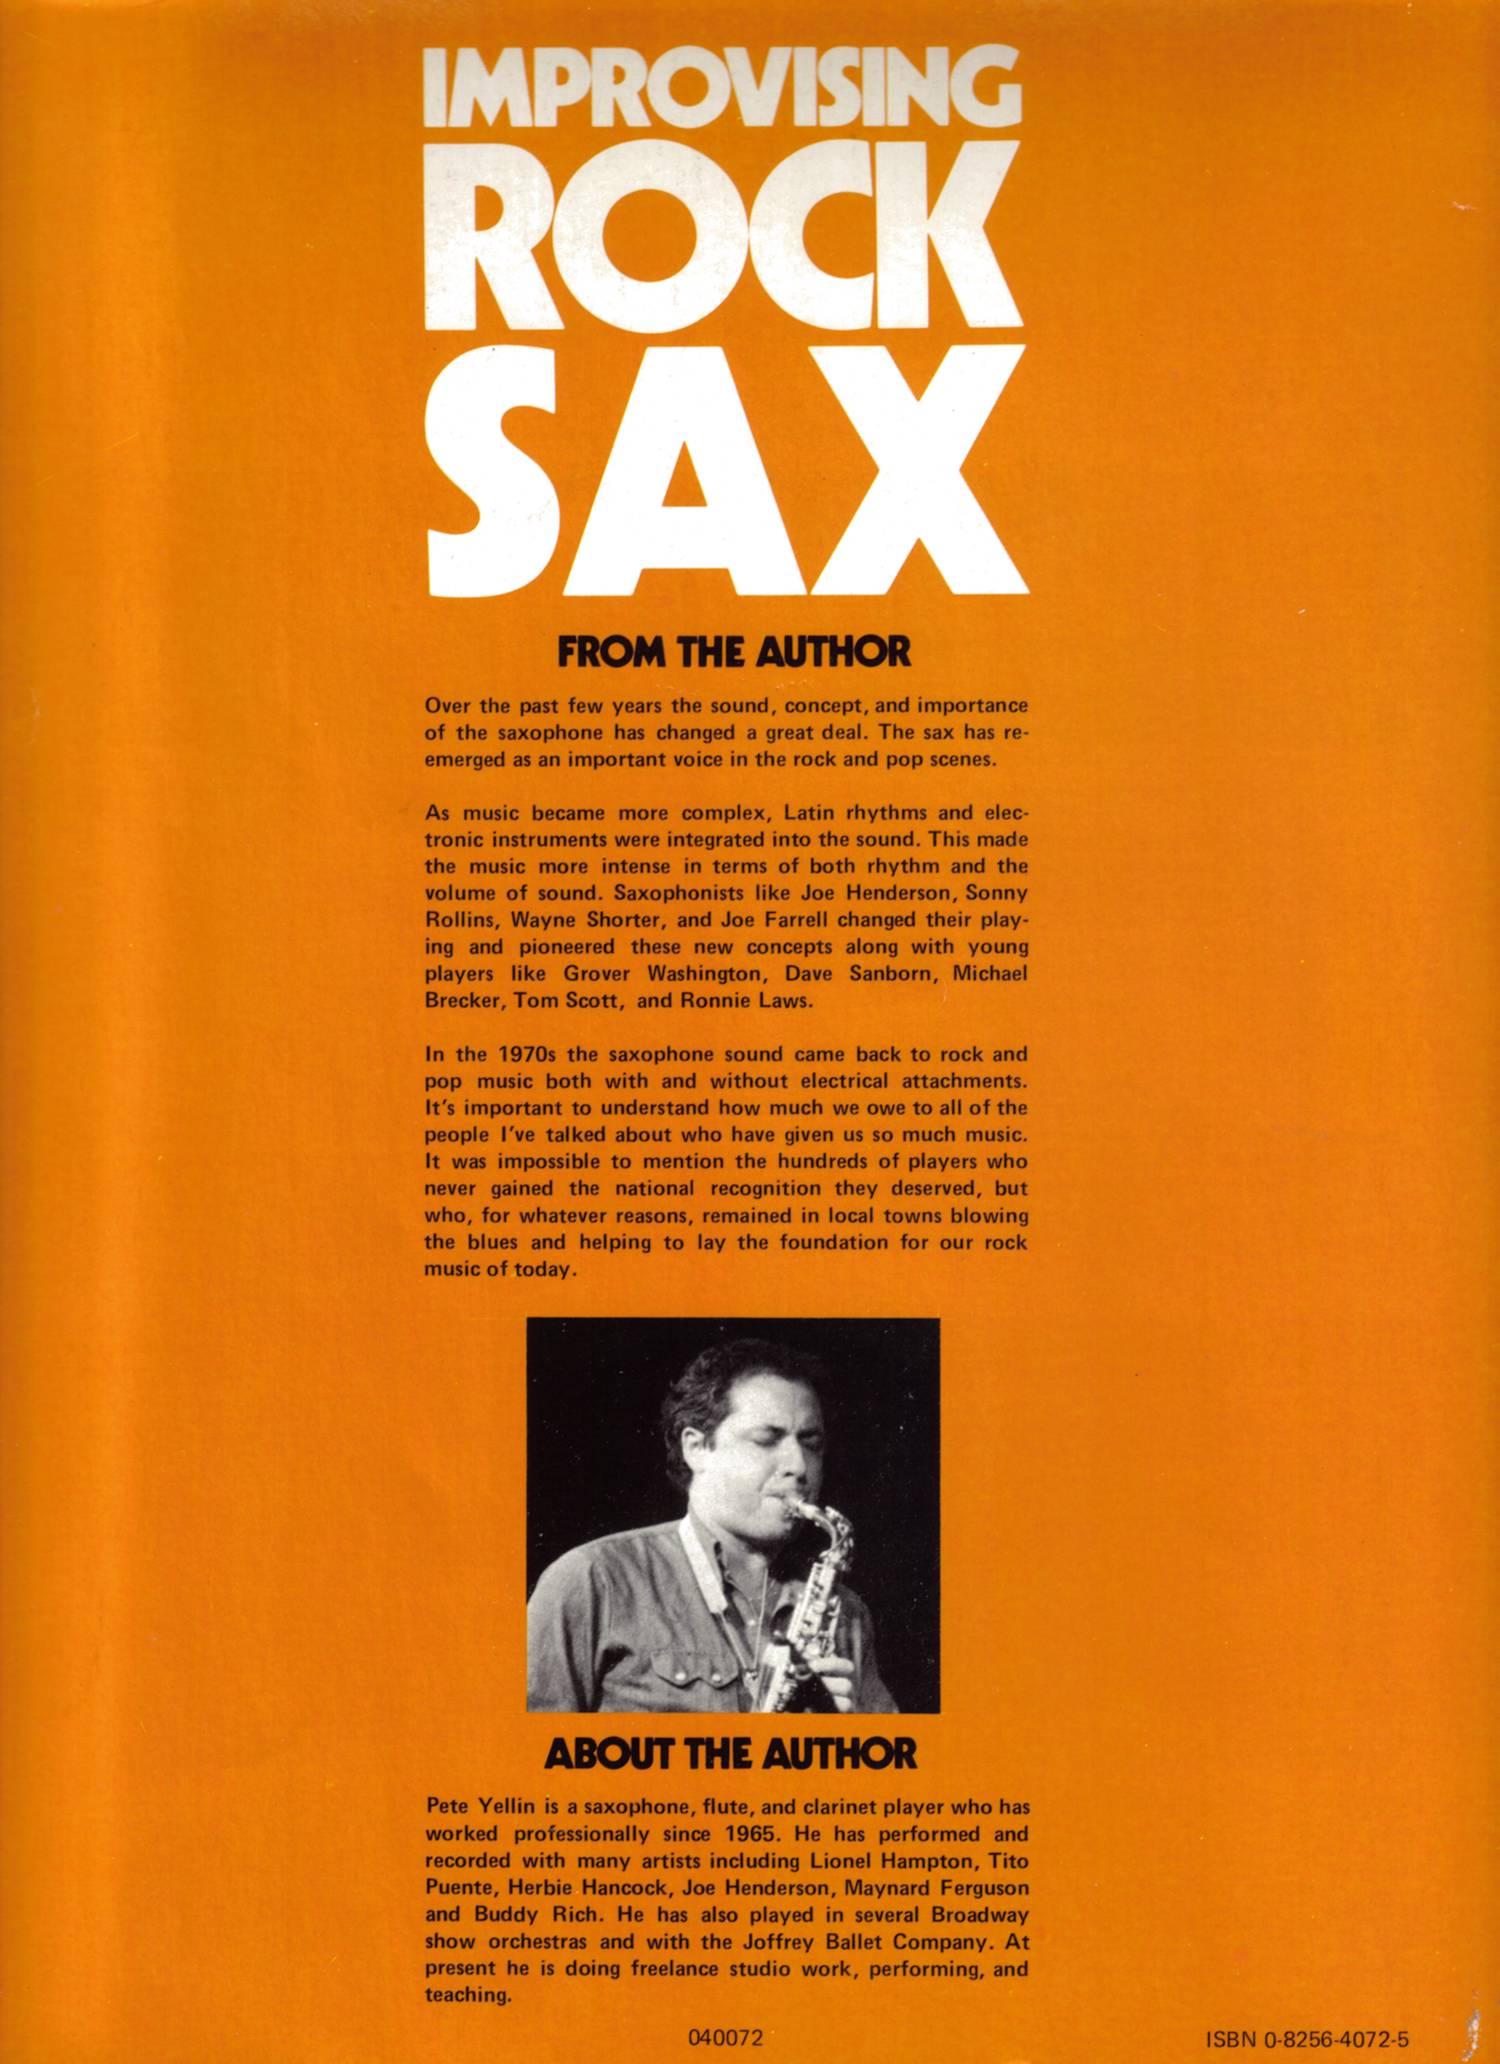 Improvising Rock Sax by Pete Yellin